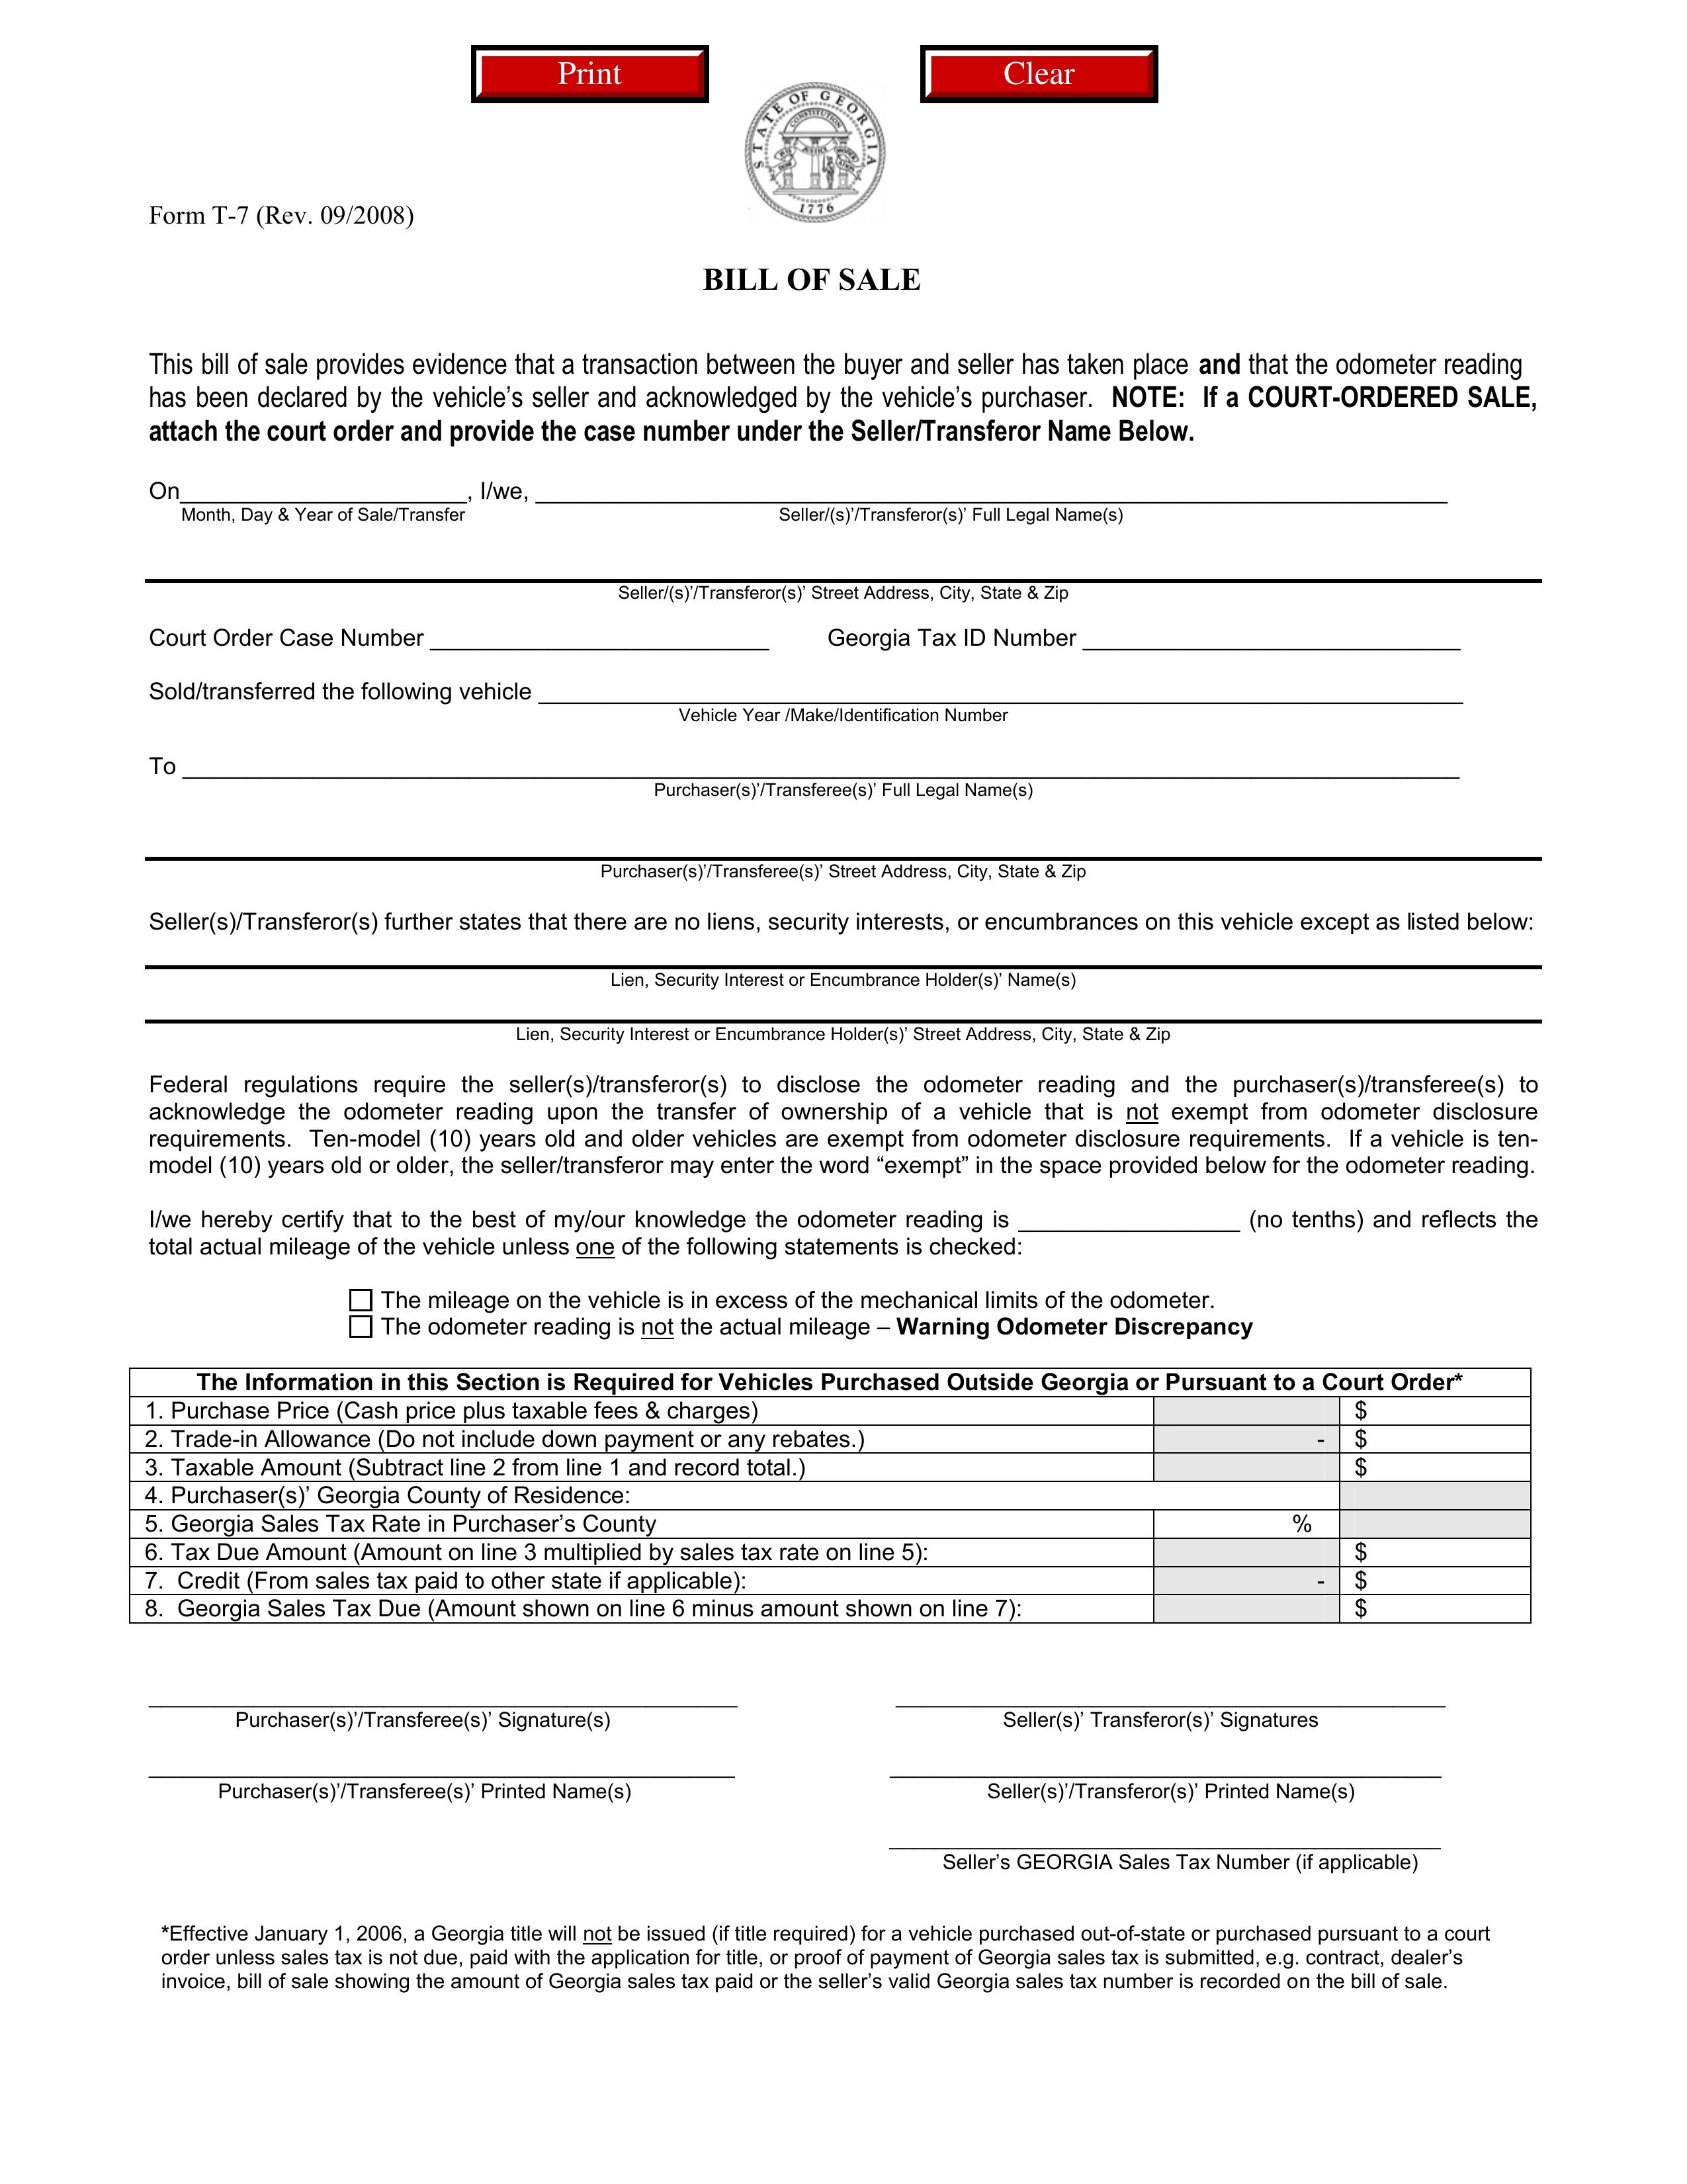 Sample Of Bill Of Sale Free Printable Documents Bill Of Sale Template Legal Forms Bill Of Sale Car